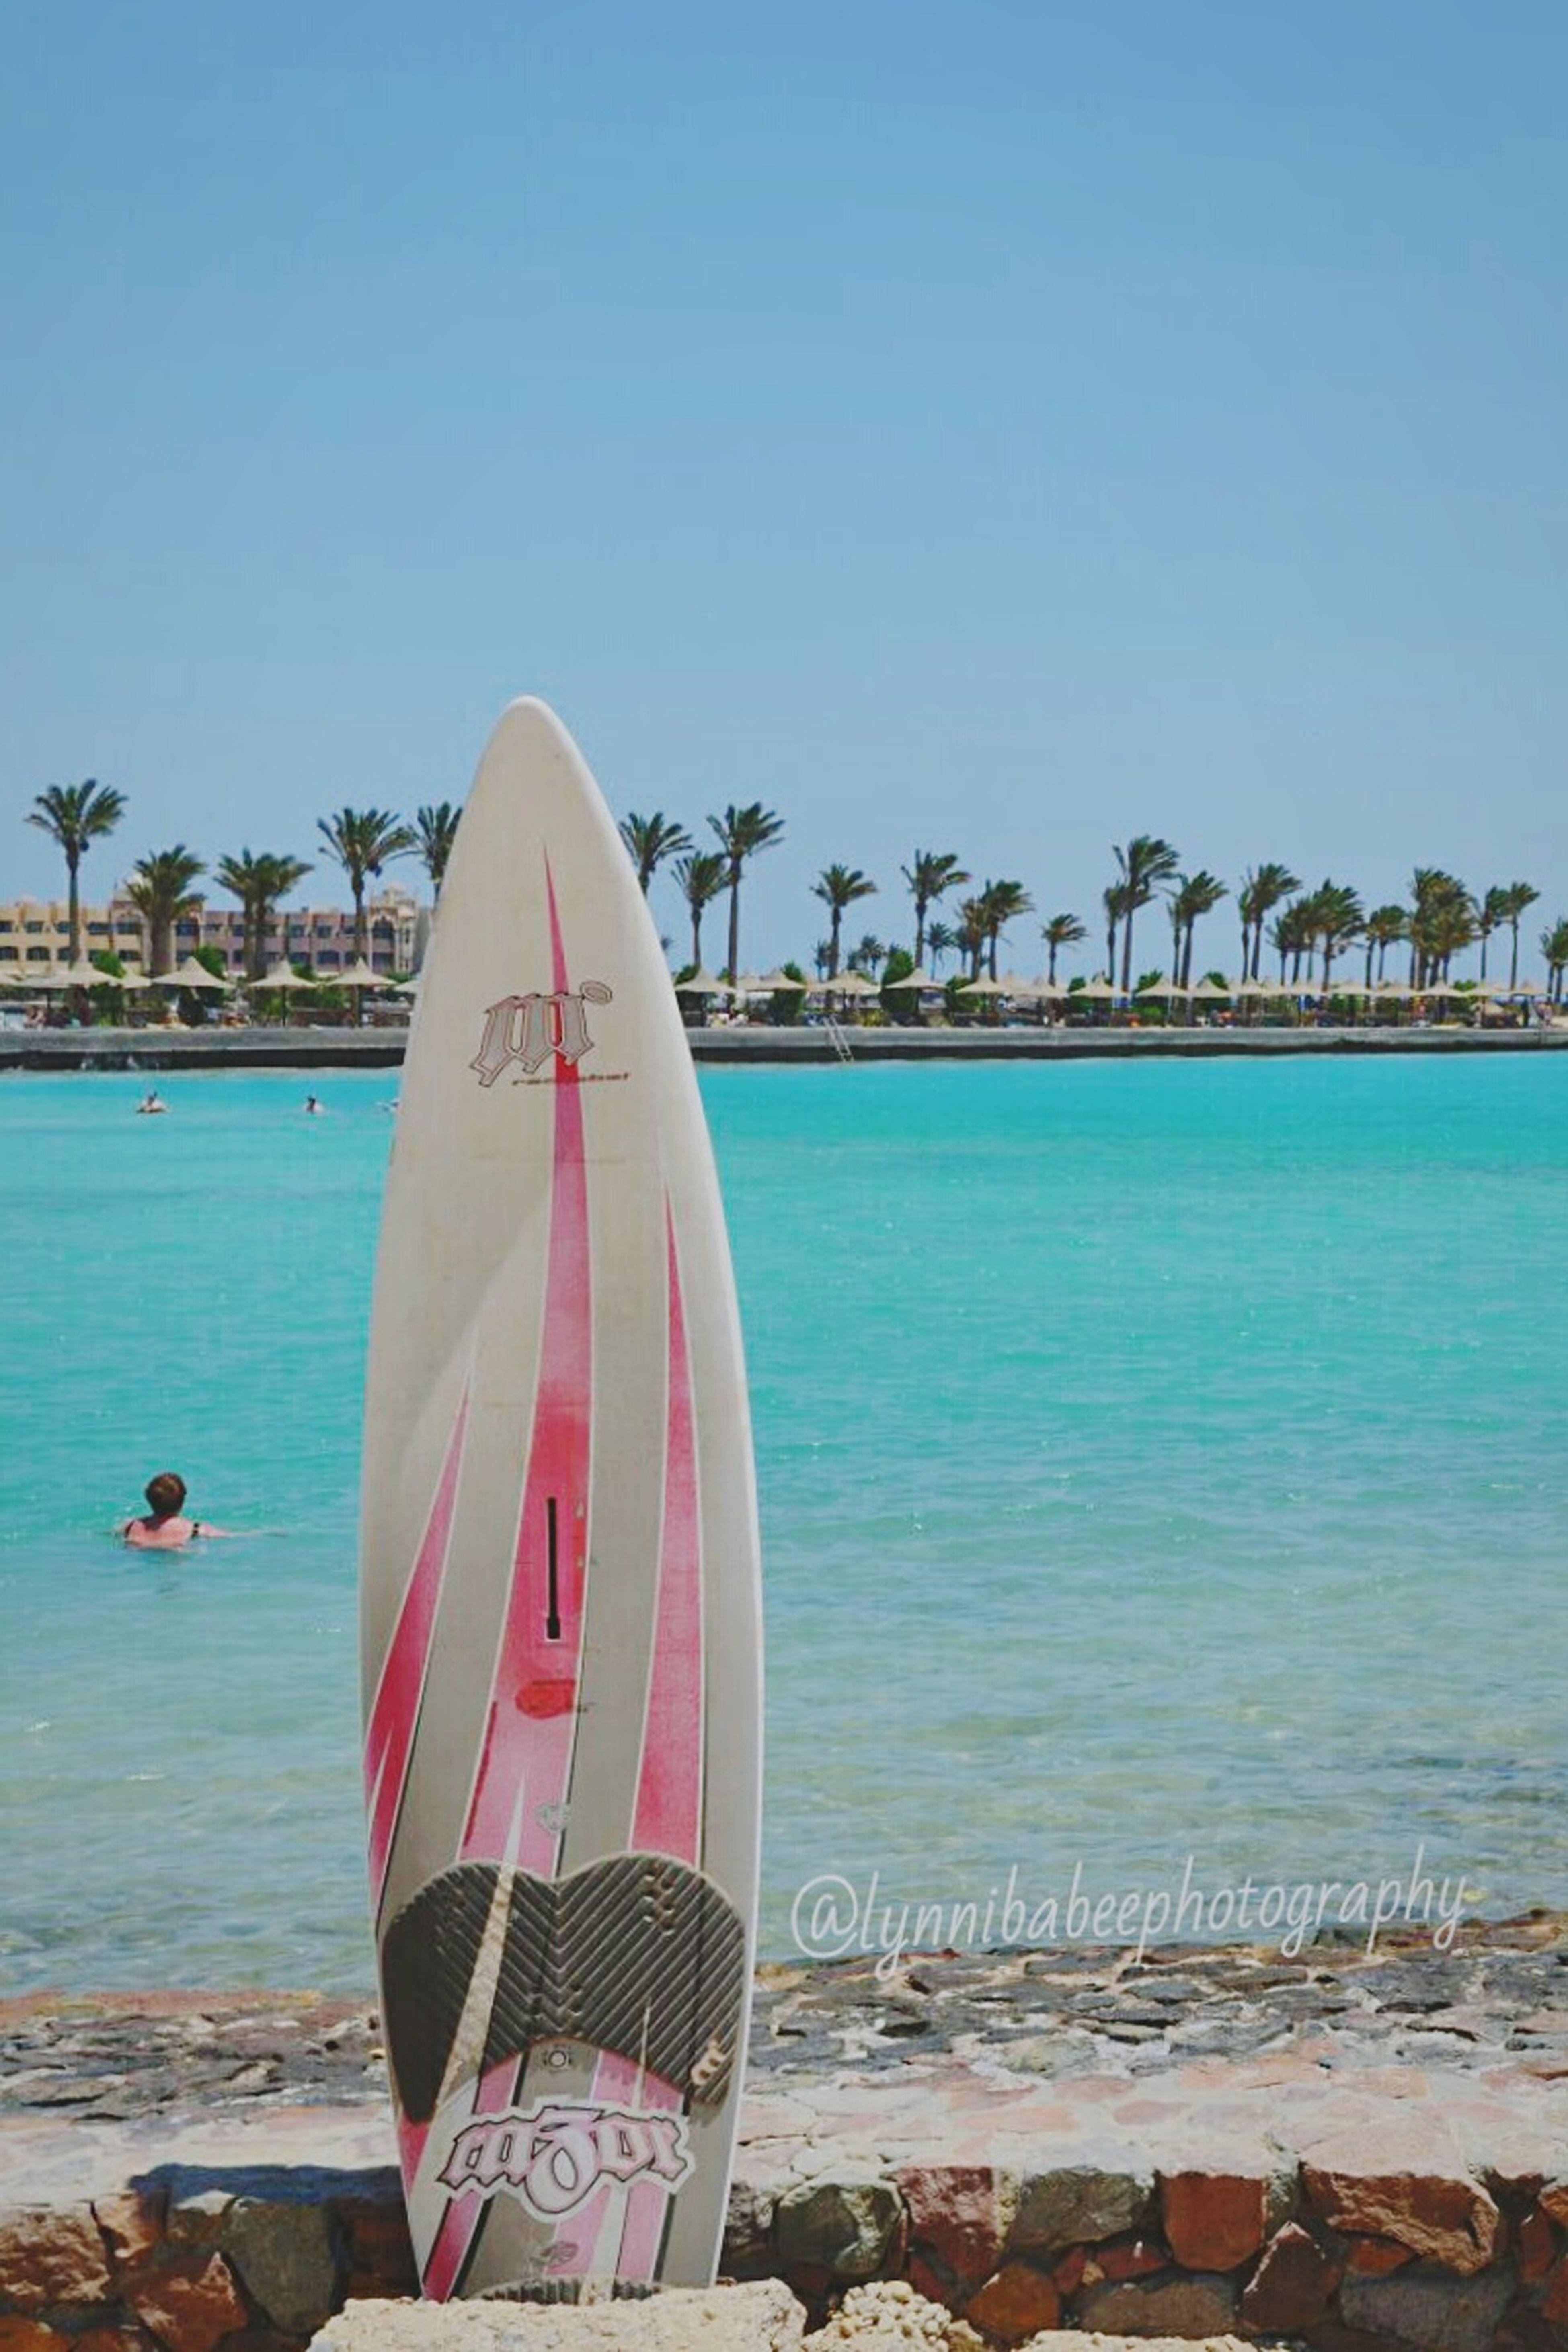 Hurghada Relaxing Hurghada Egypt Summerparadise First Eyeem Photo